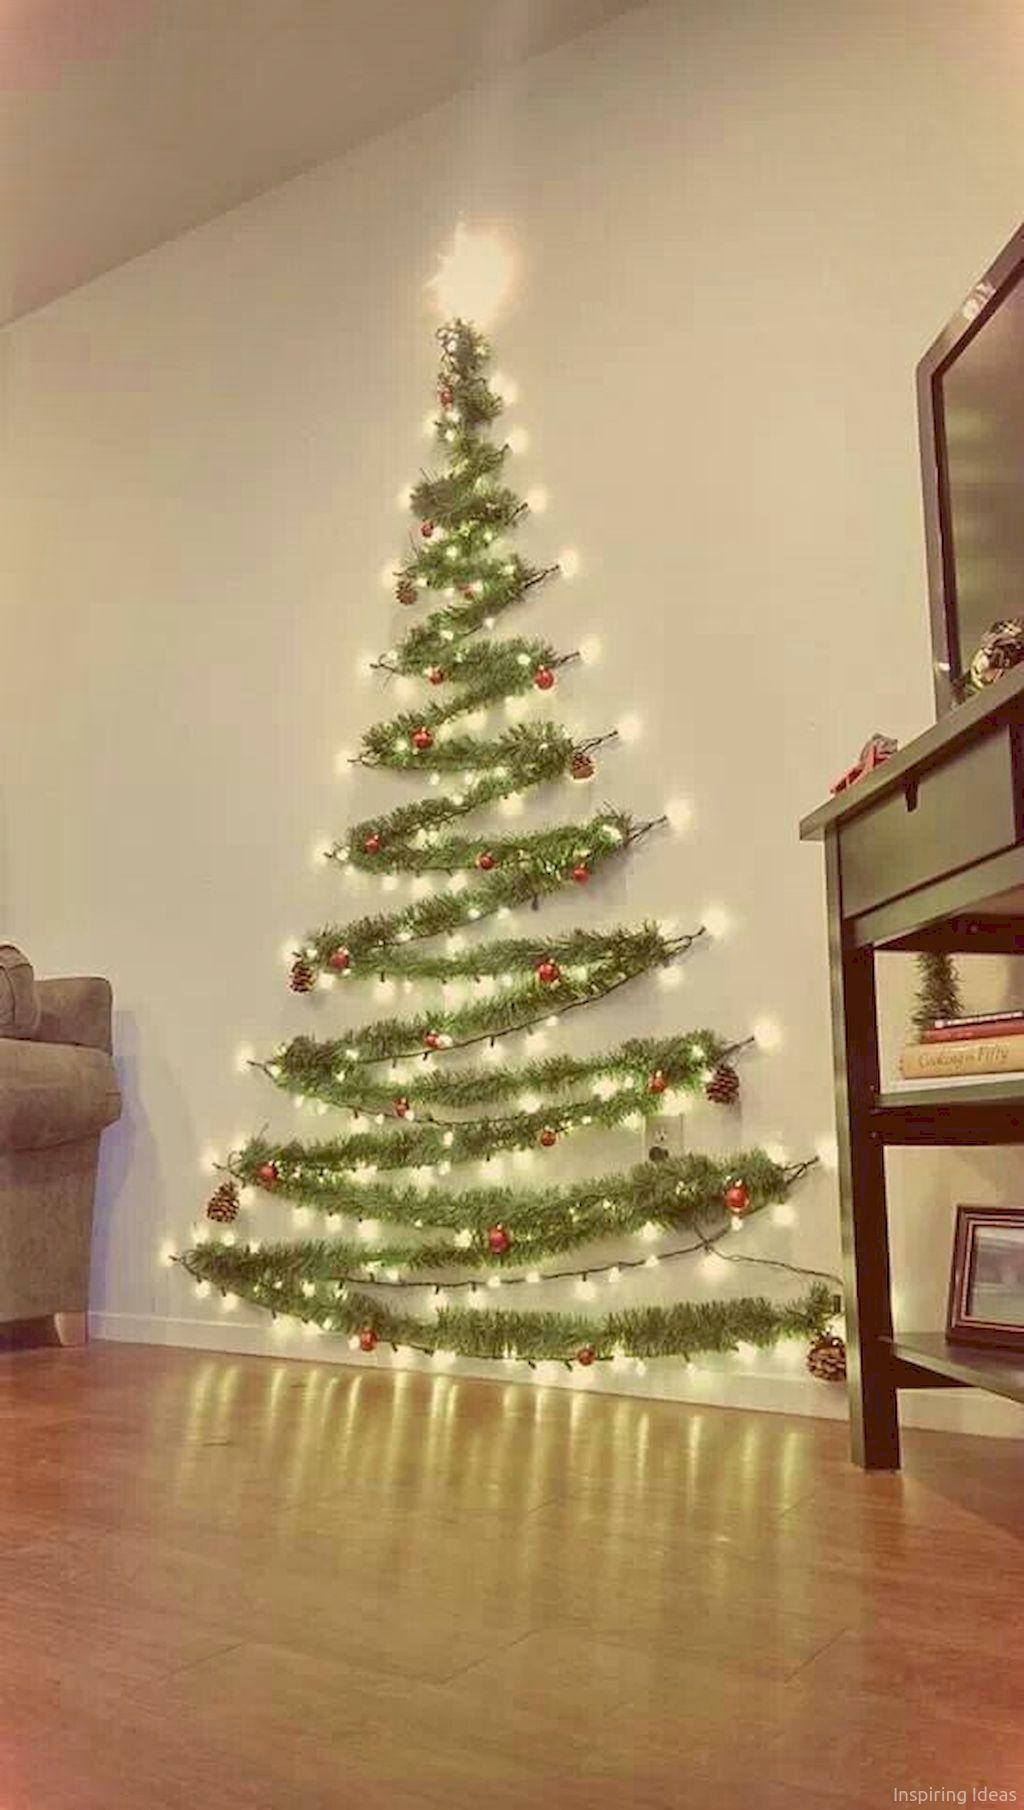 Awesome 125 Extra Cozy Apartment Decorating Ideas Https Roomaniac Com 125 Extra Cozy Apa Wall Christmas Tree Easy Christmas Decorations Christmas Decorations